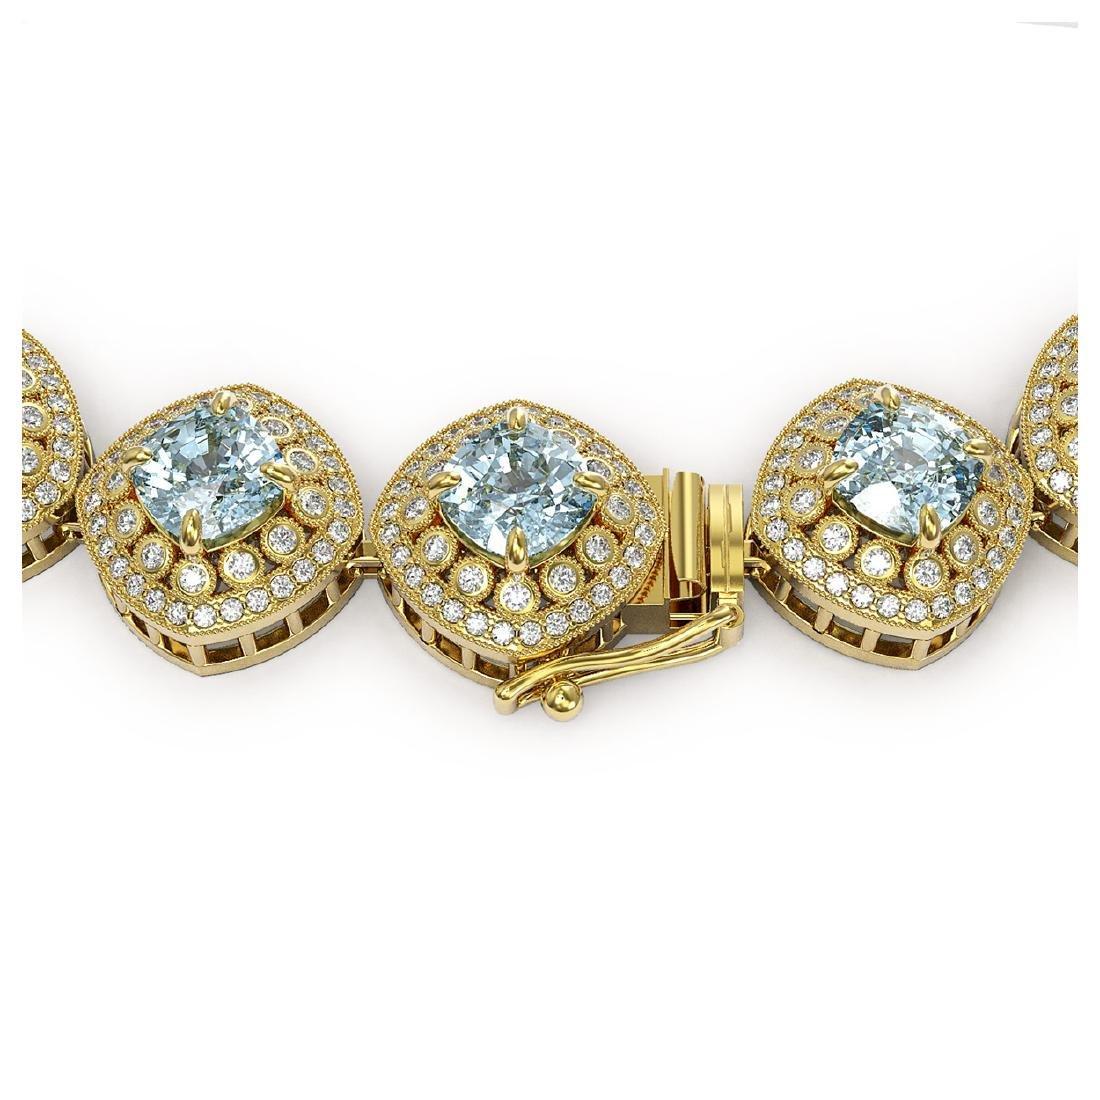 72.27 ctw Aquamarine & Diamond Necklace 14K Yellow Gold - 3